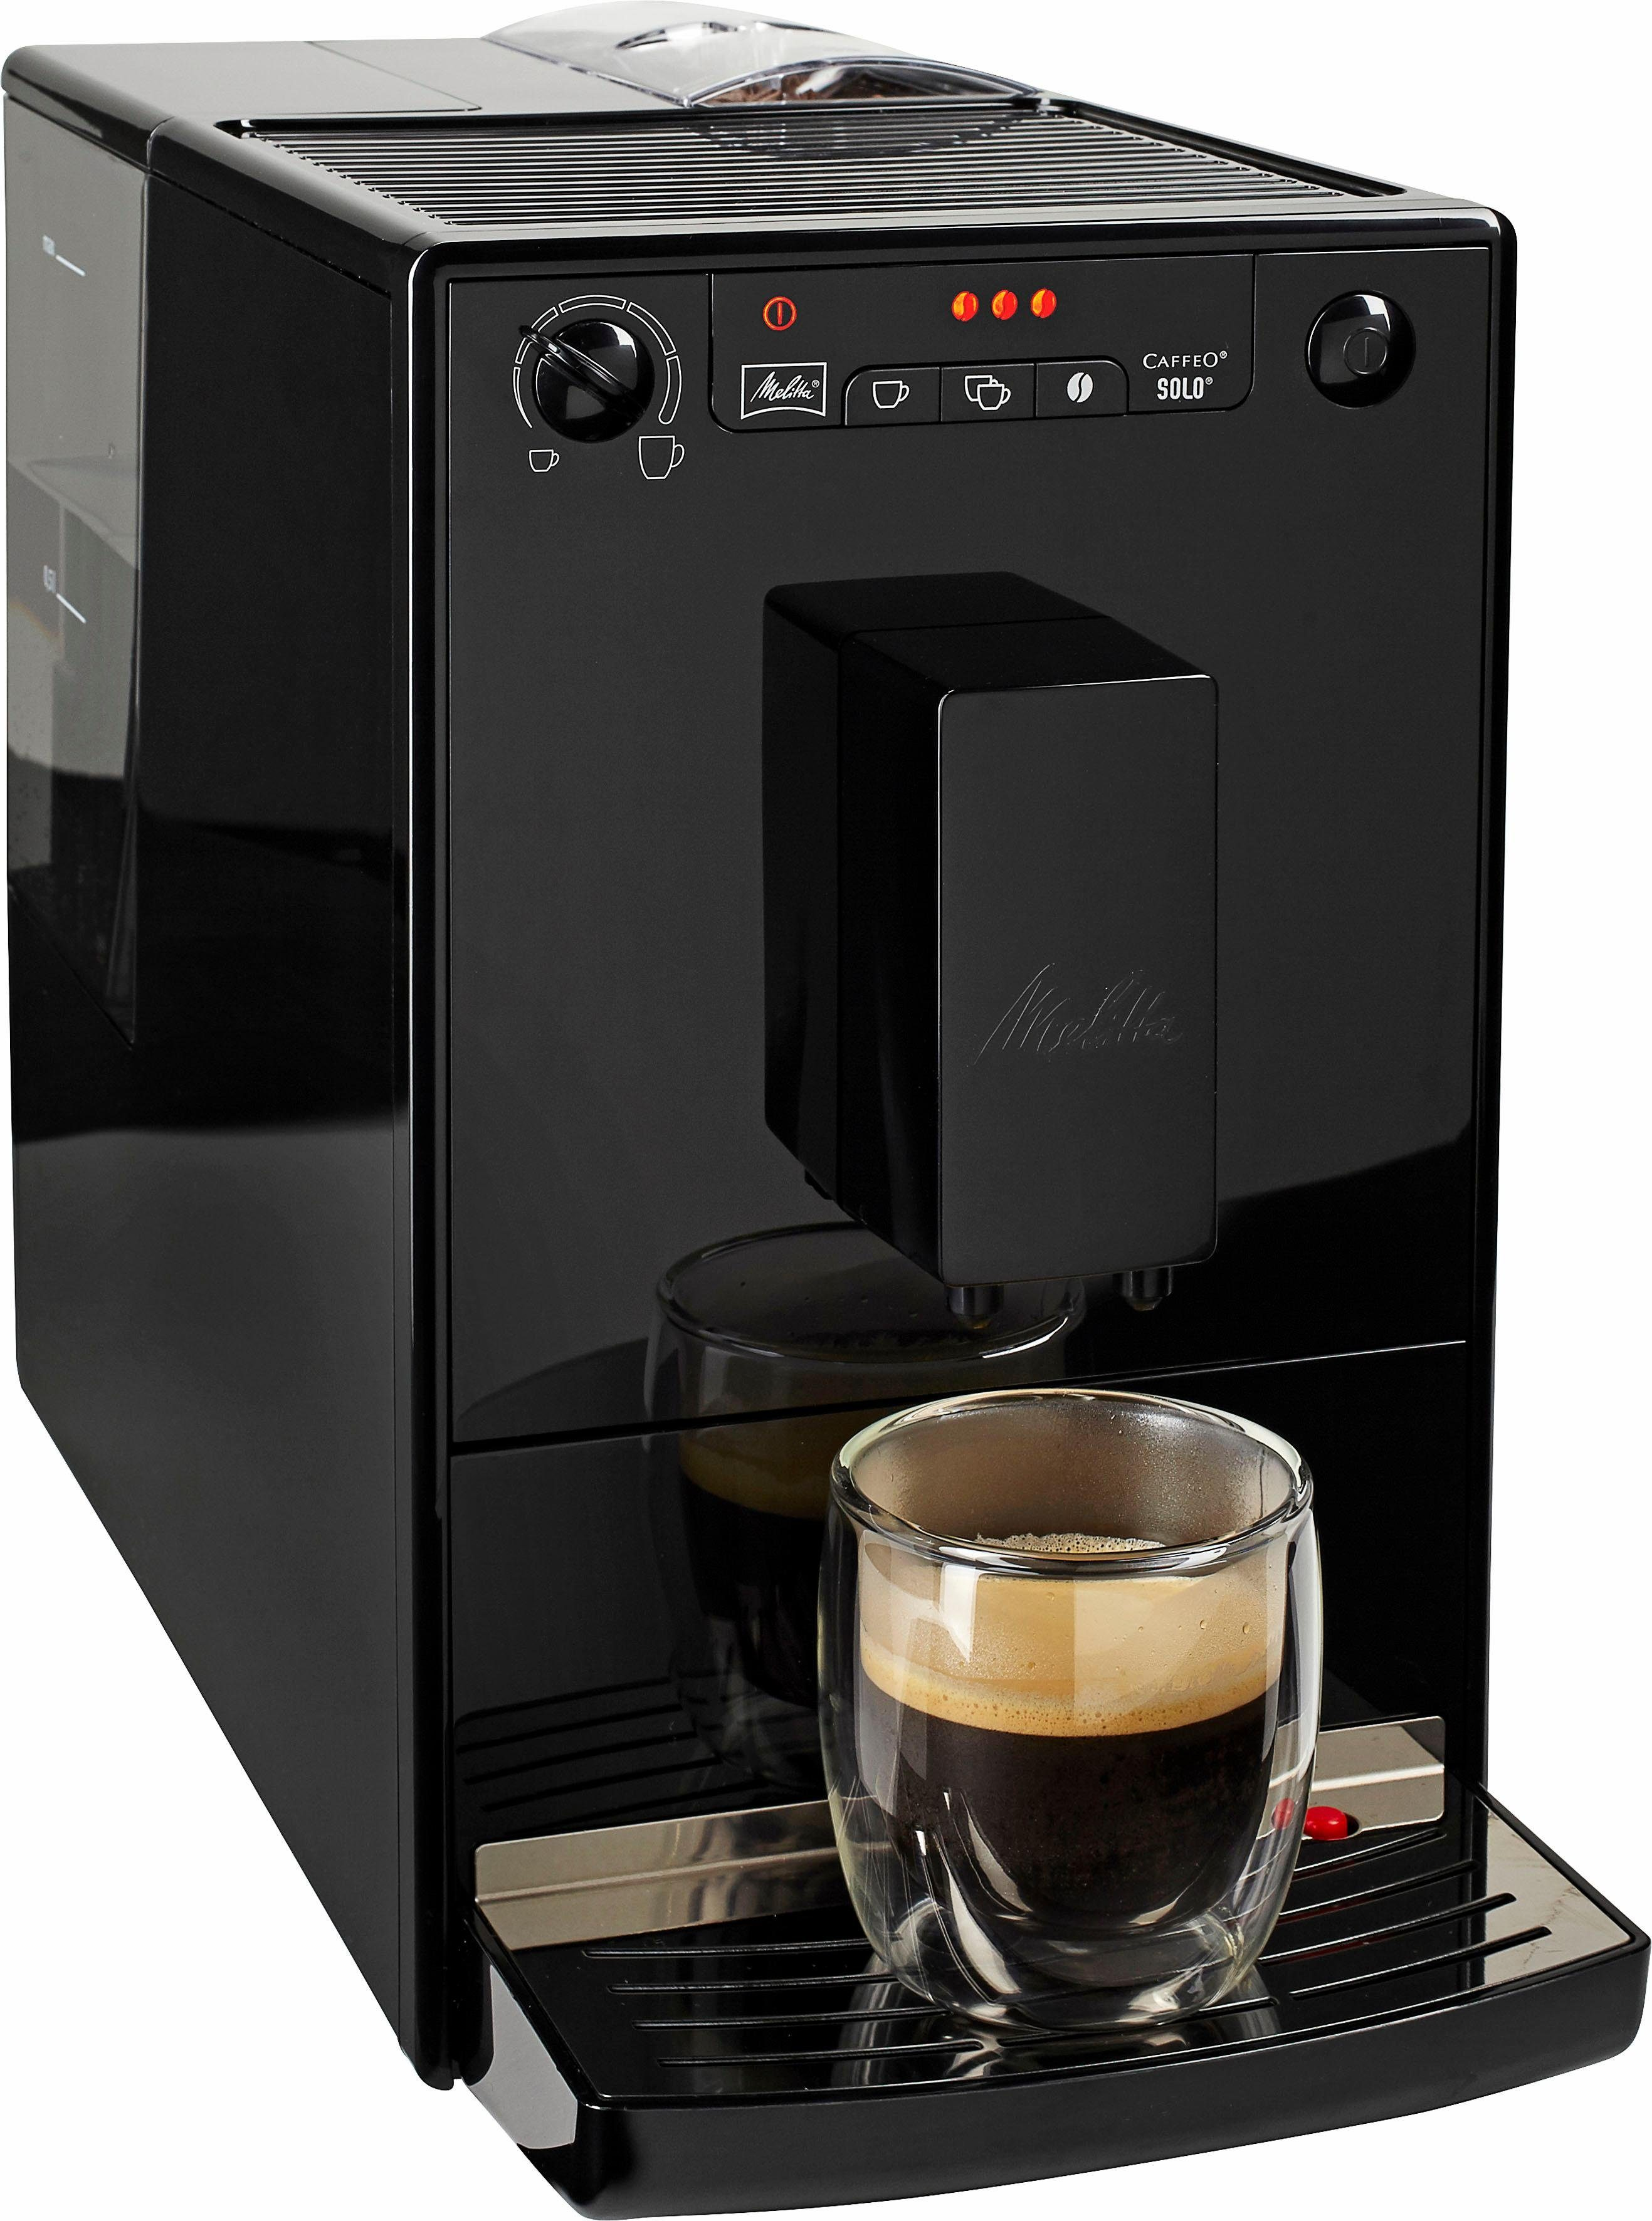 Melitta Kaffeevollautomat CAFFEO® Solo® Pure Black E 950-222, 1,2l Tank, Kegelmahlwerk